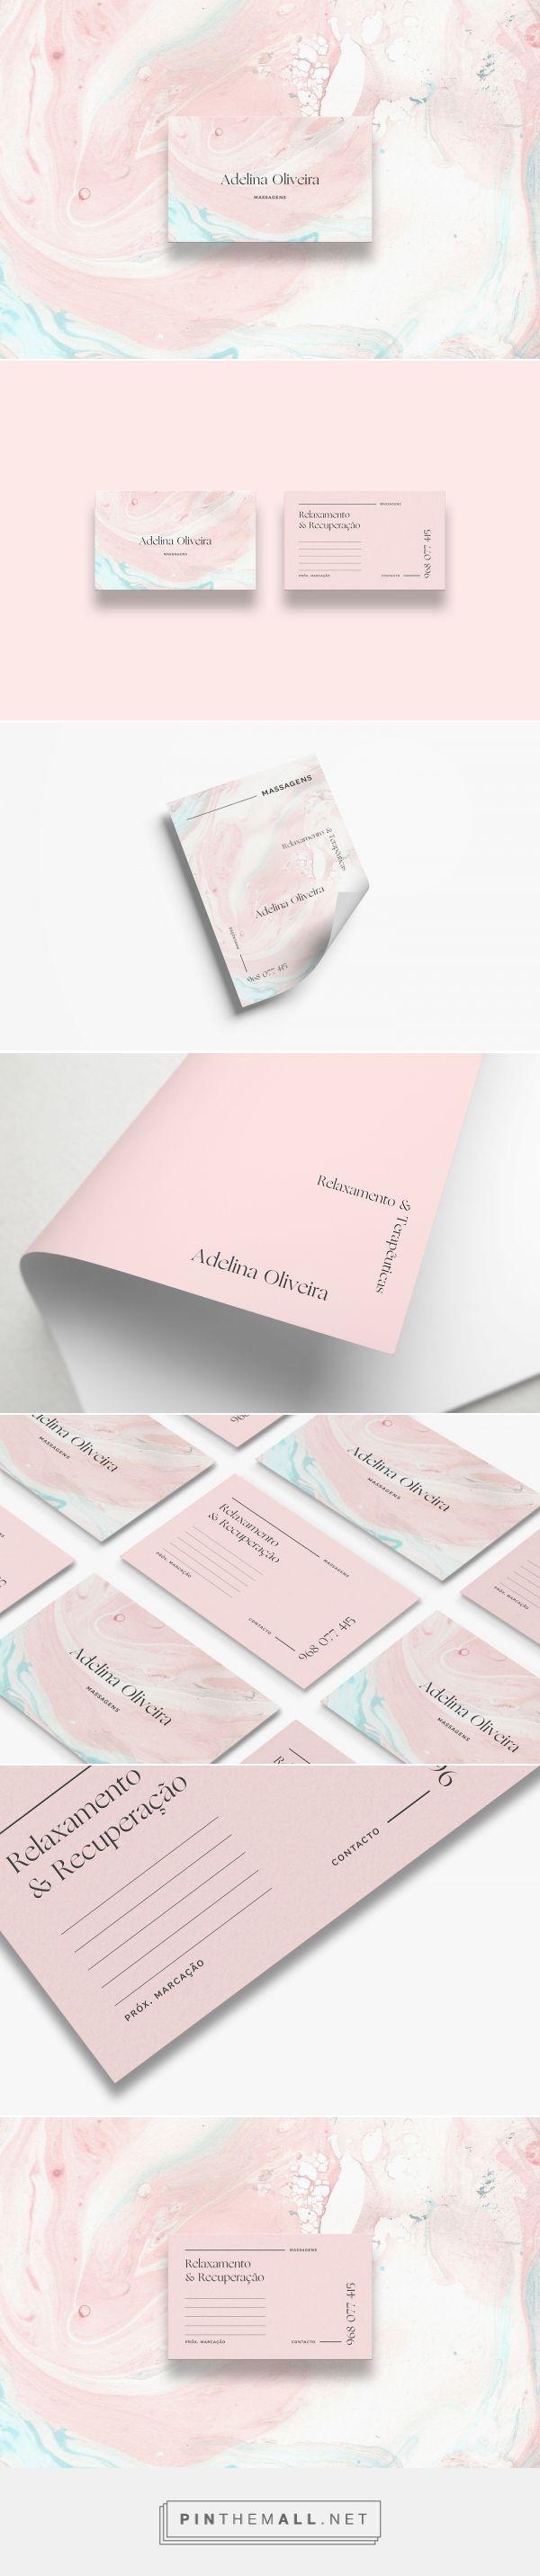 Adelina Oliveira Massage Therapist Branding by Nock Design | Fivestar Branding Agency – Design and Branding Agency & Inspiration Gallery: